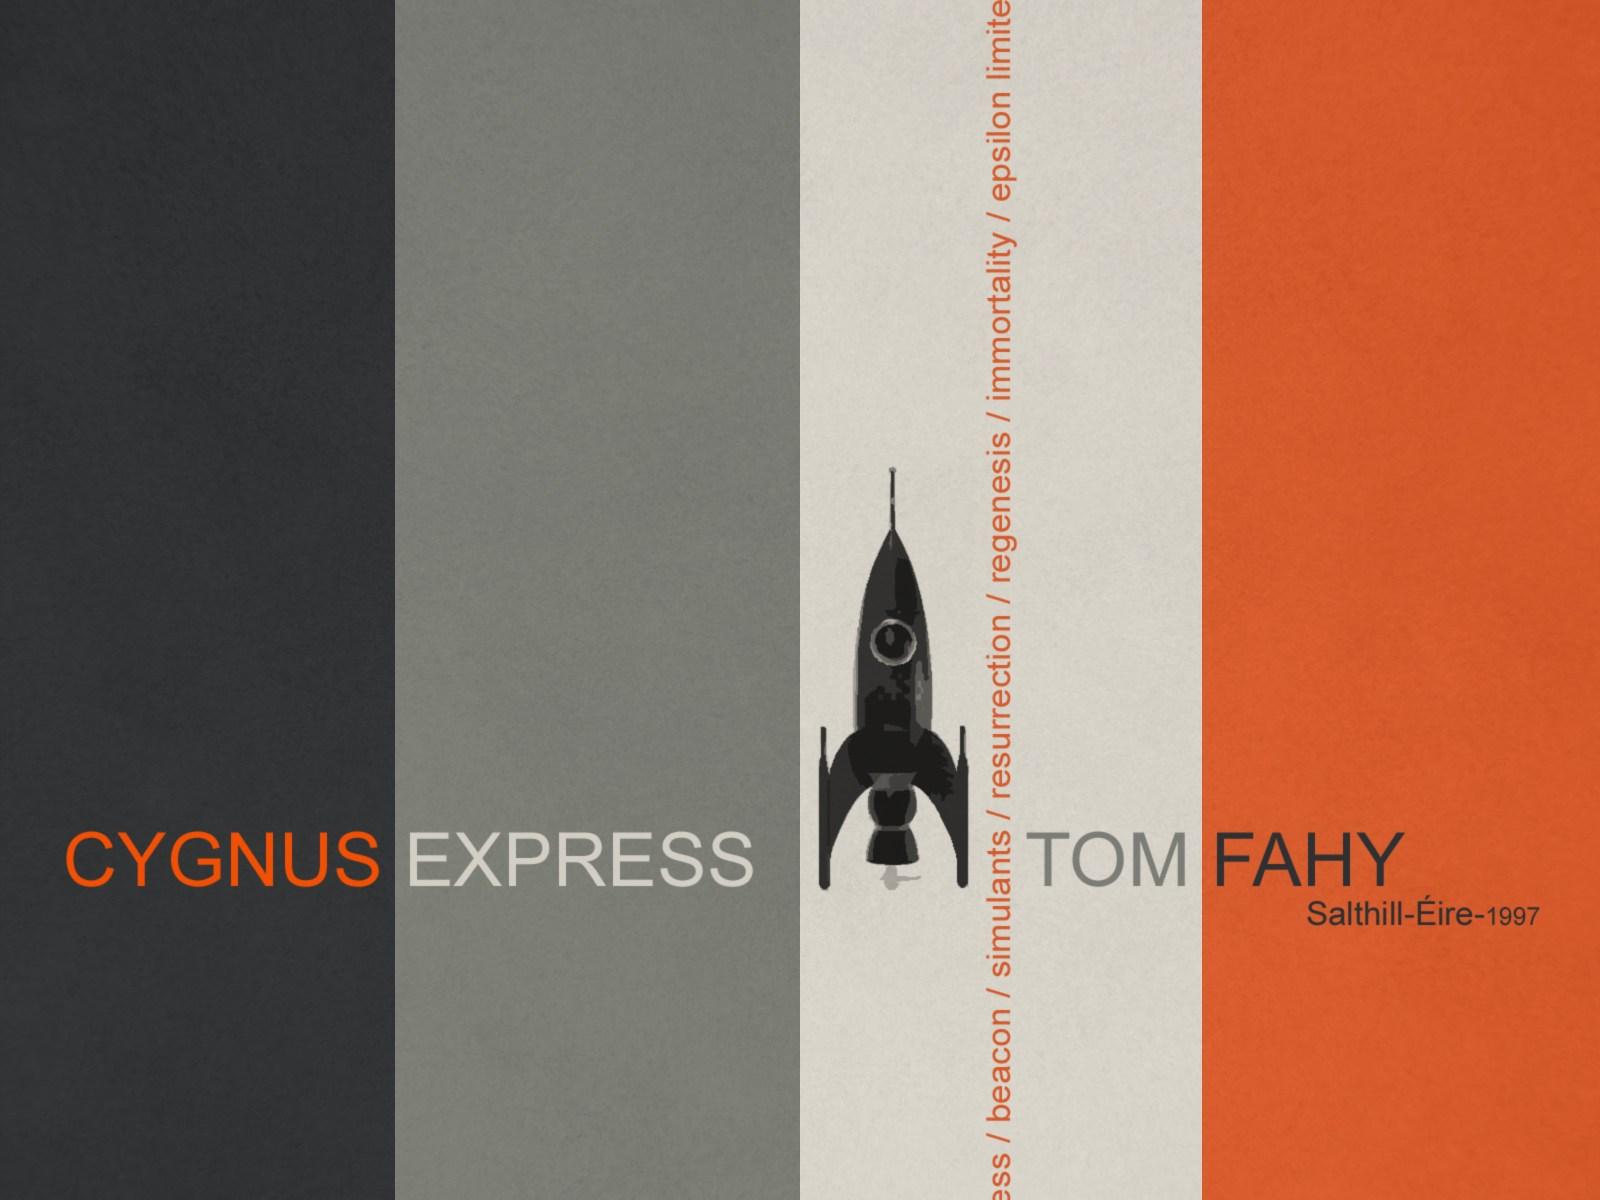 Cygnus Express, by Tom Fahy